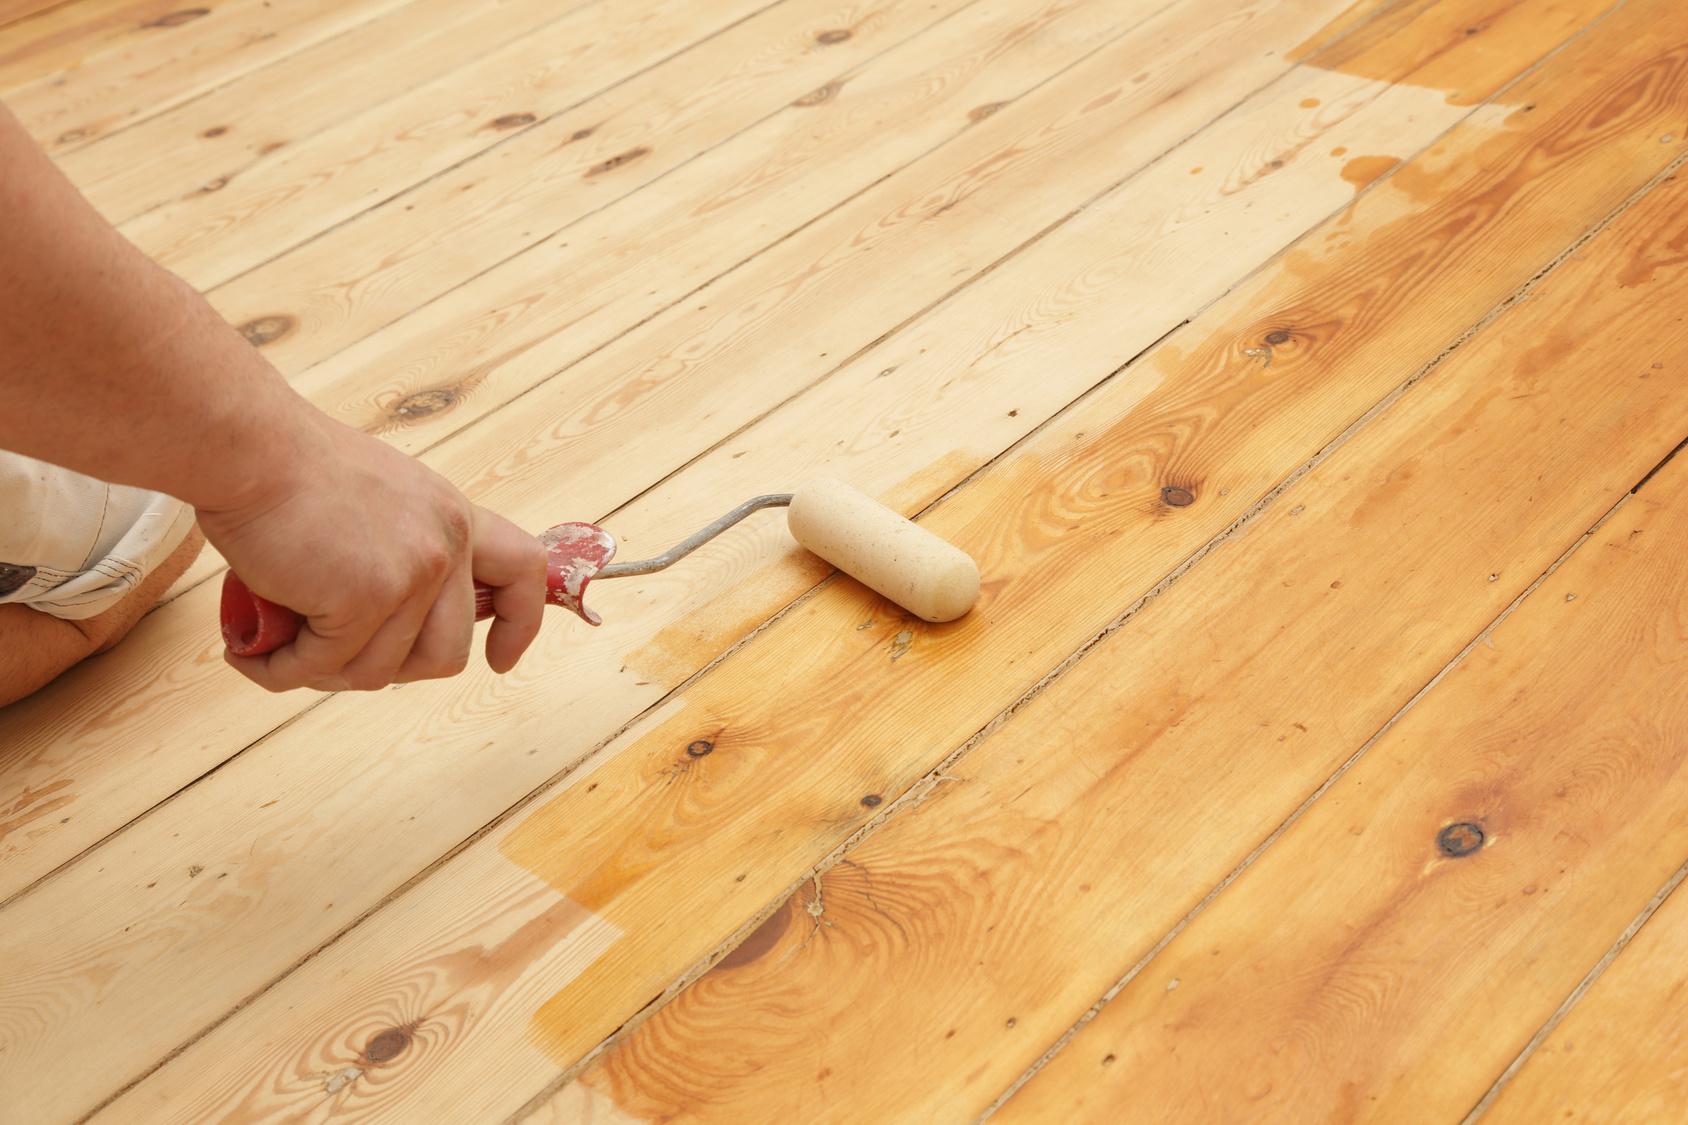 Holzfußboden Lackieren Oder Wachsen ~ Parkett lackieren anleitung und infos theo schrauben.de